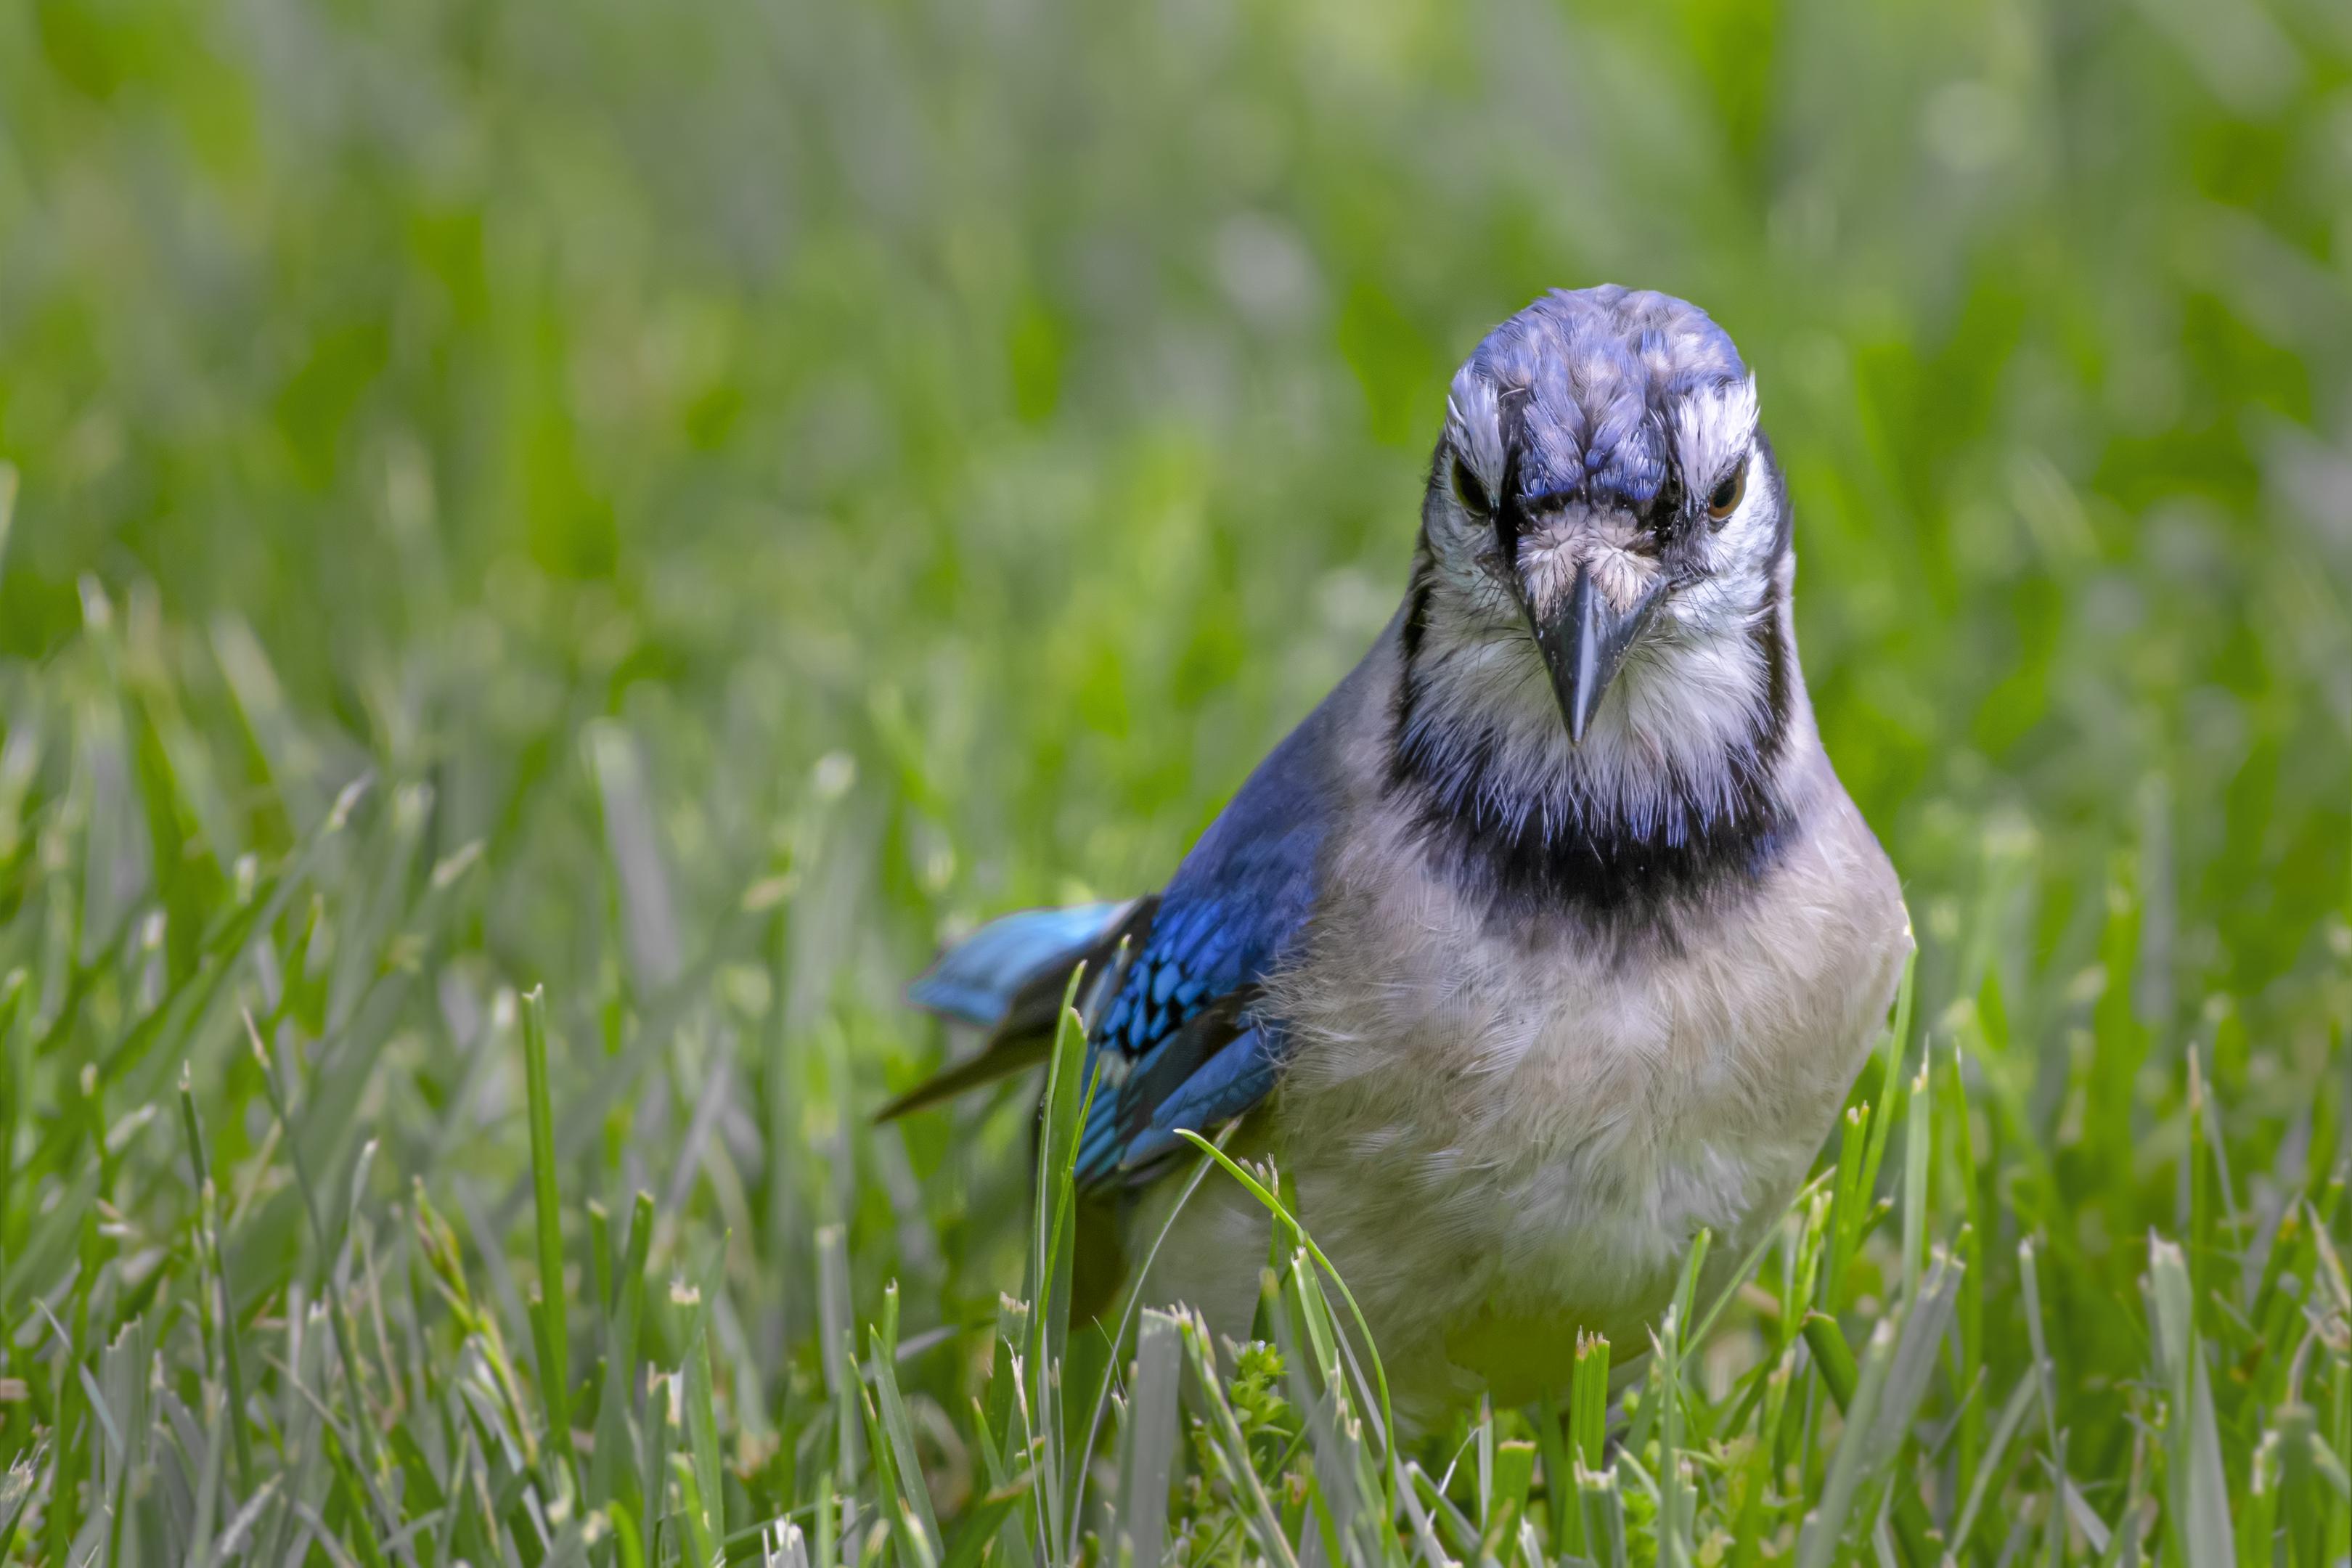 Blue-Jay-face-on